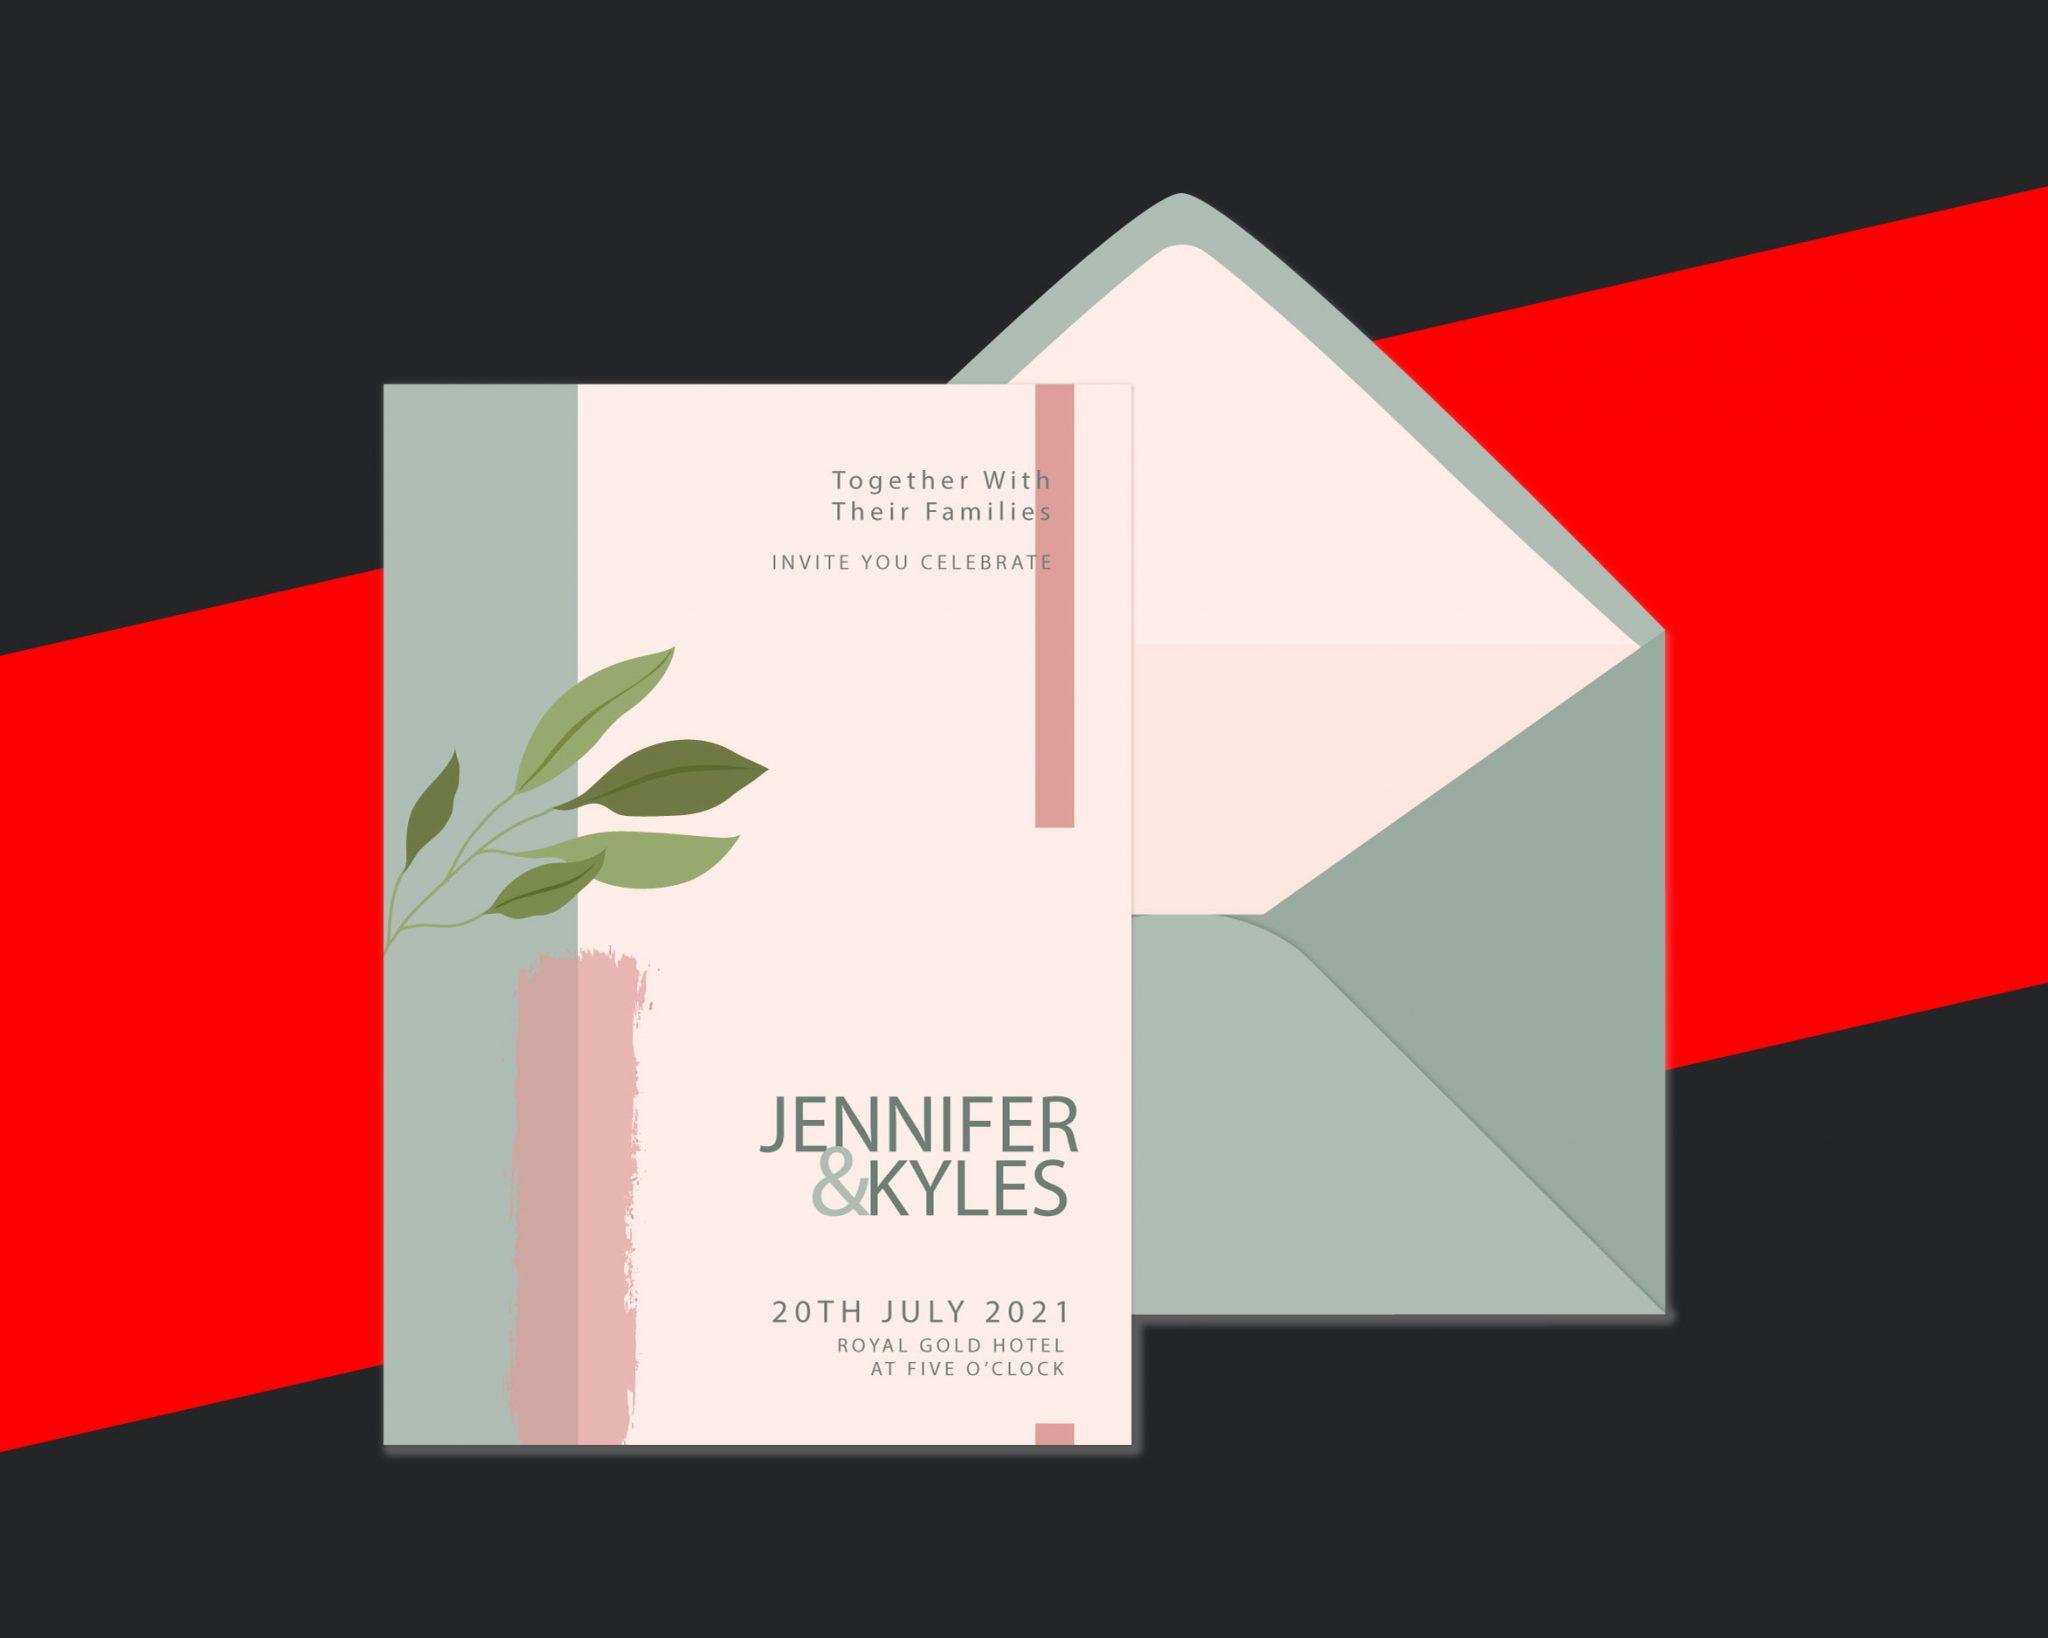 SAMPLE WEDDING CARD DESIGN - 2